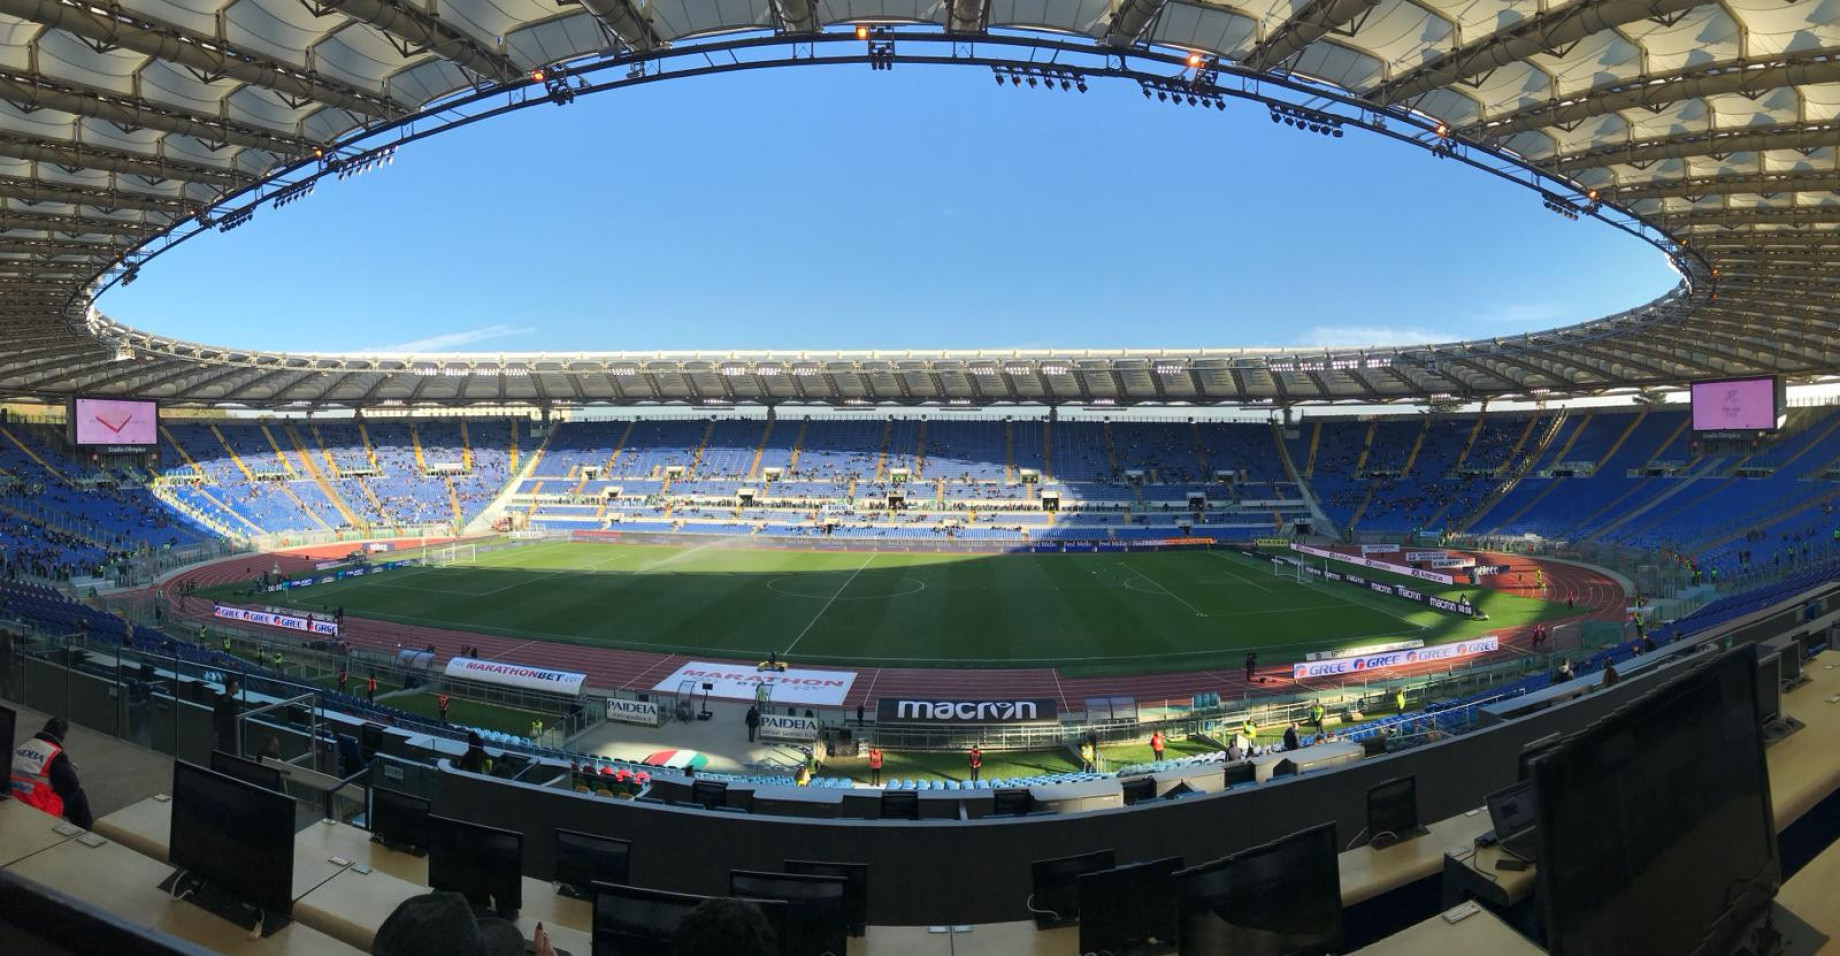 stadio_olimpico_lazio.jpeg